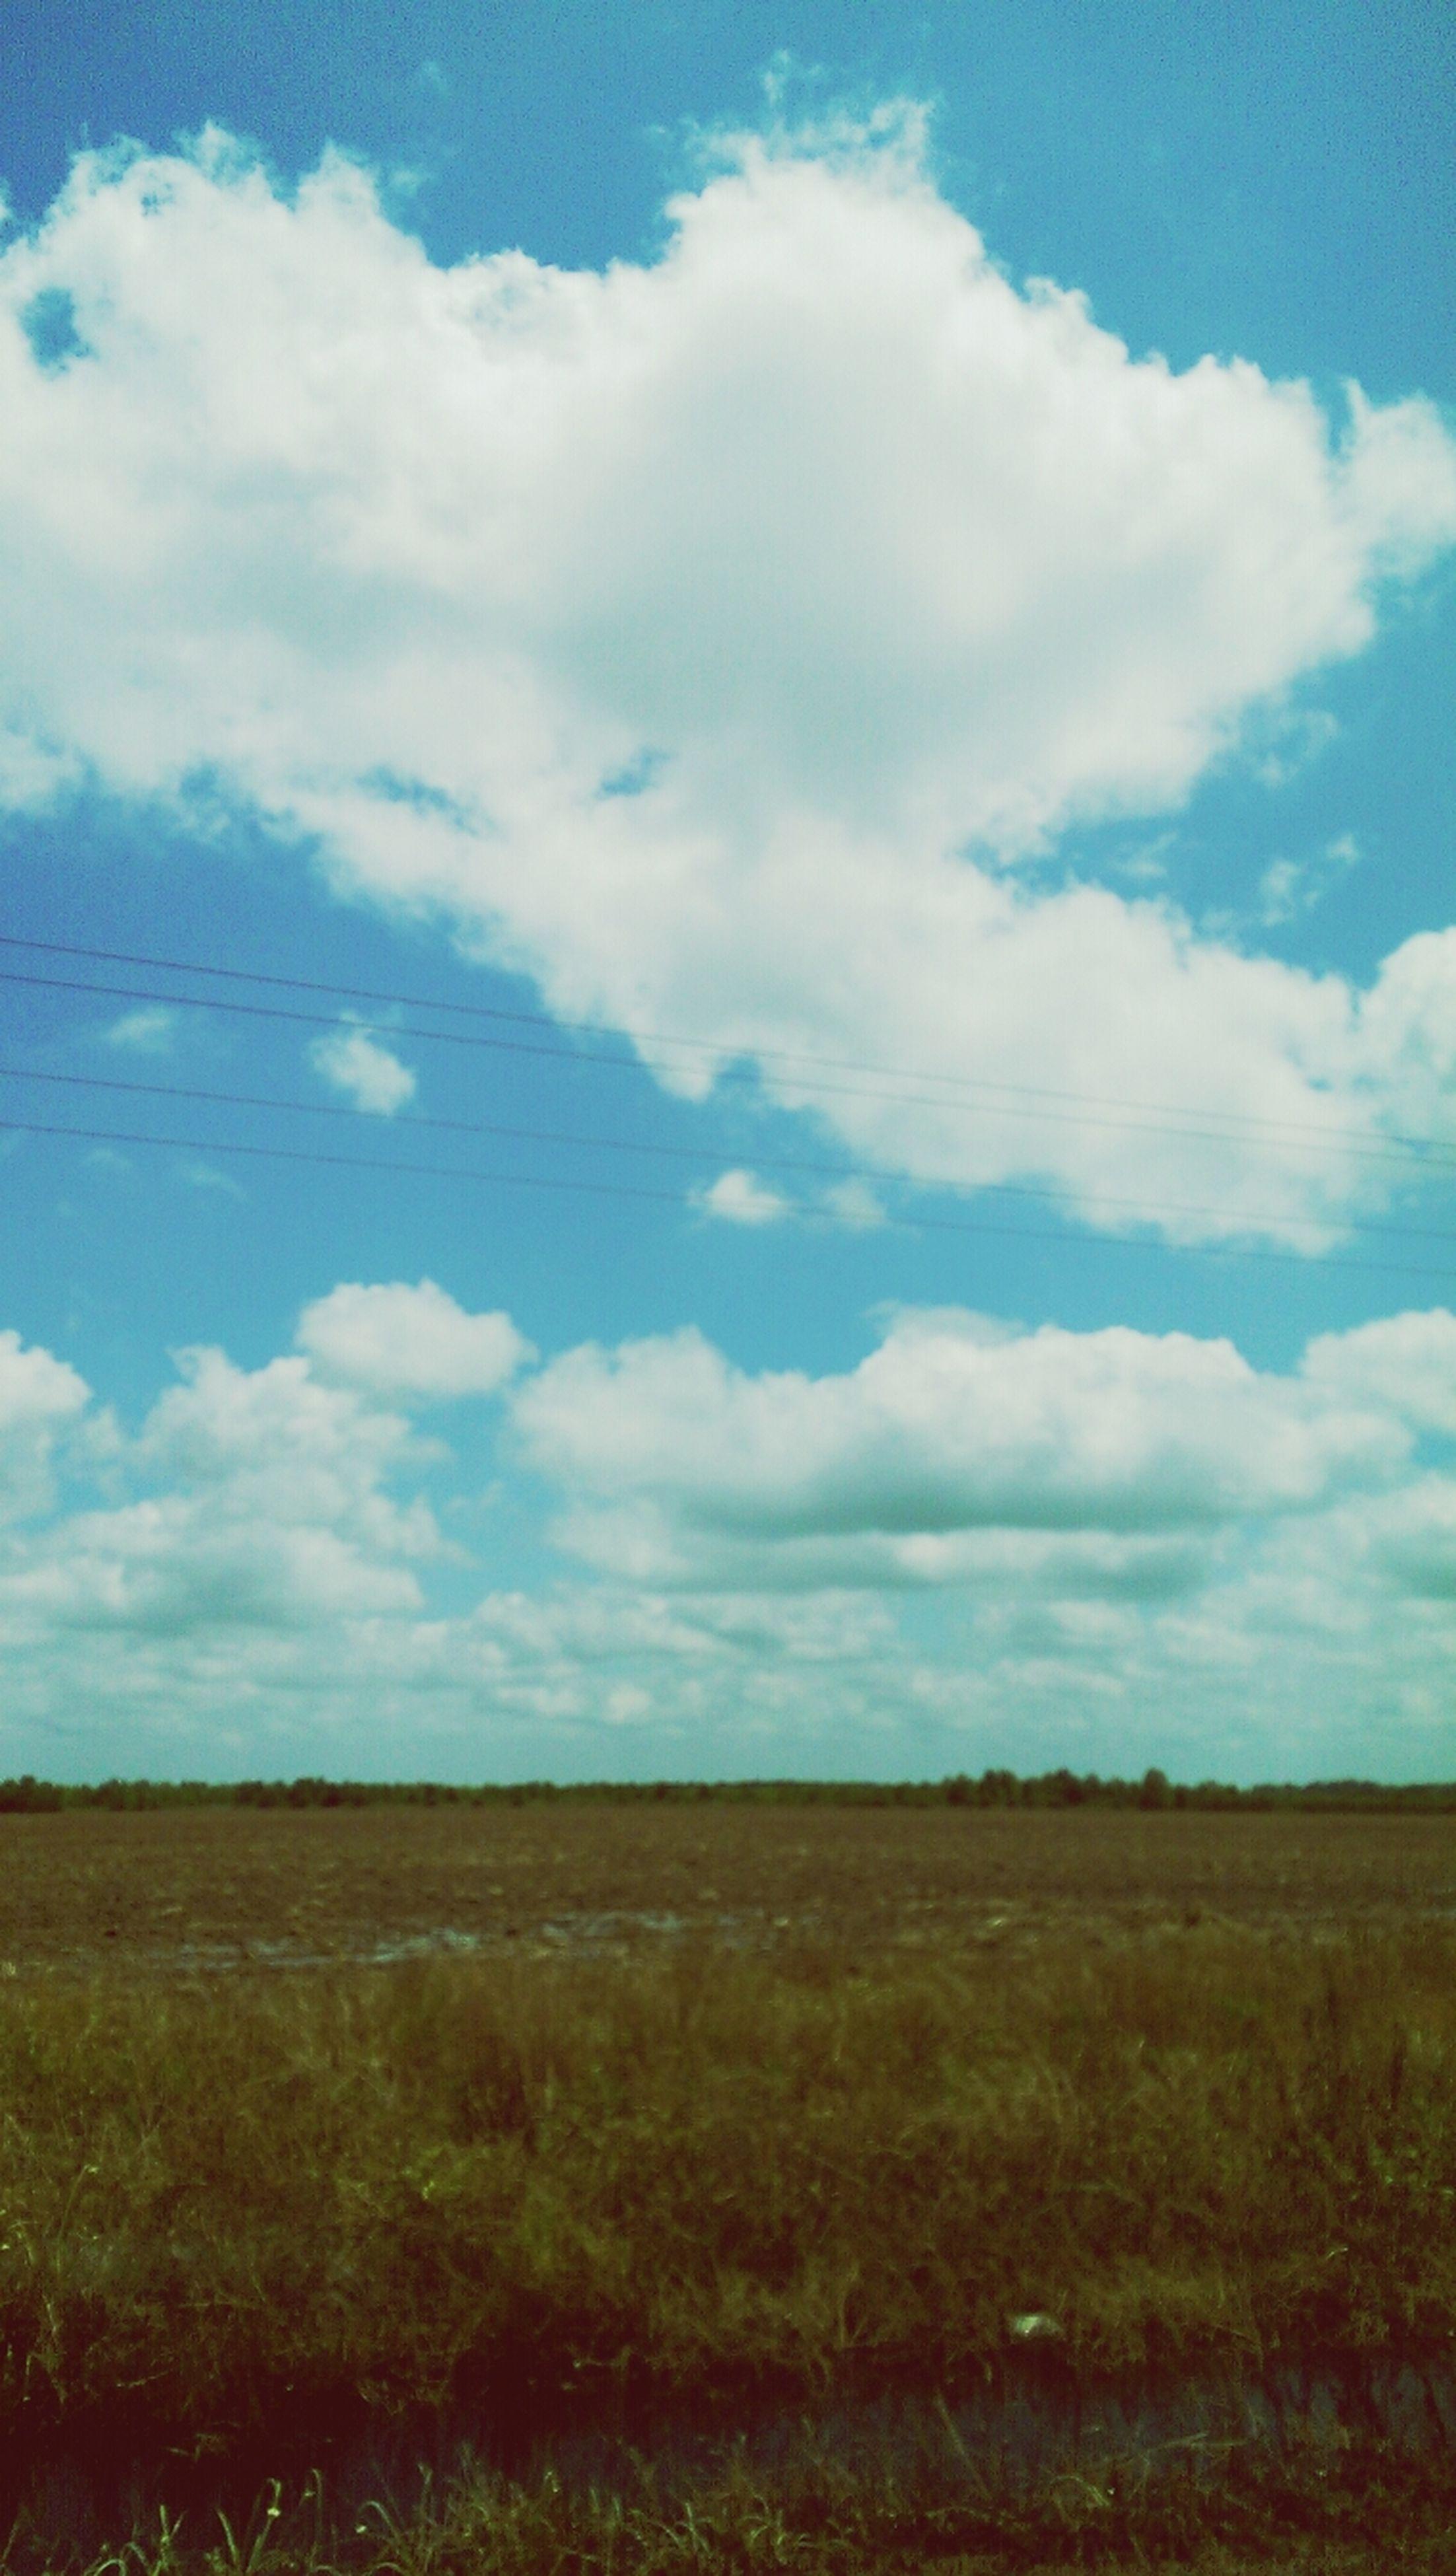 sky, landscape, tranquil scene, tranquility, cloud - sky, field, scenics, cloud, grass, beauty in nature, nature, horizon over land, blue, cloudy, non-urban scene, remote, rural scene, day, grassy, idyllic